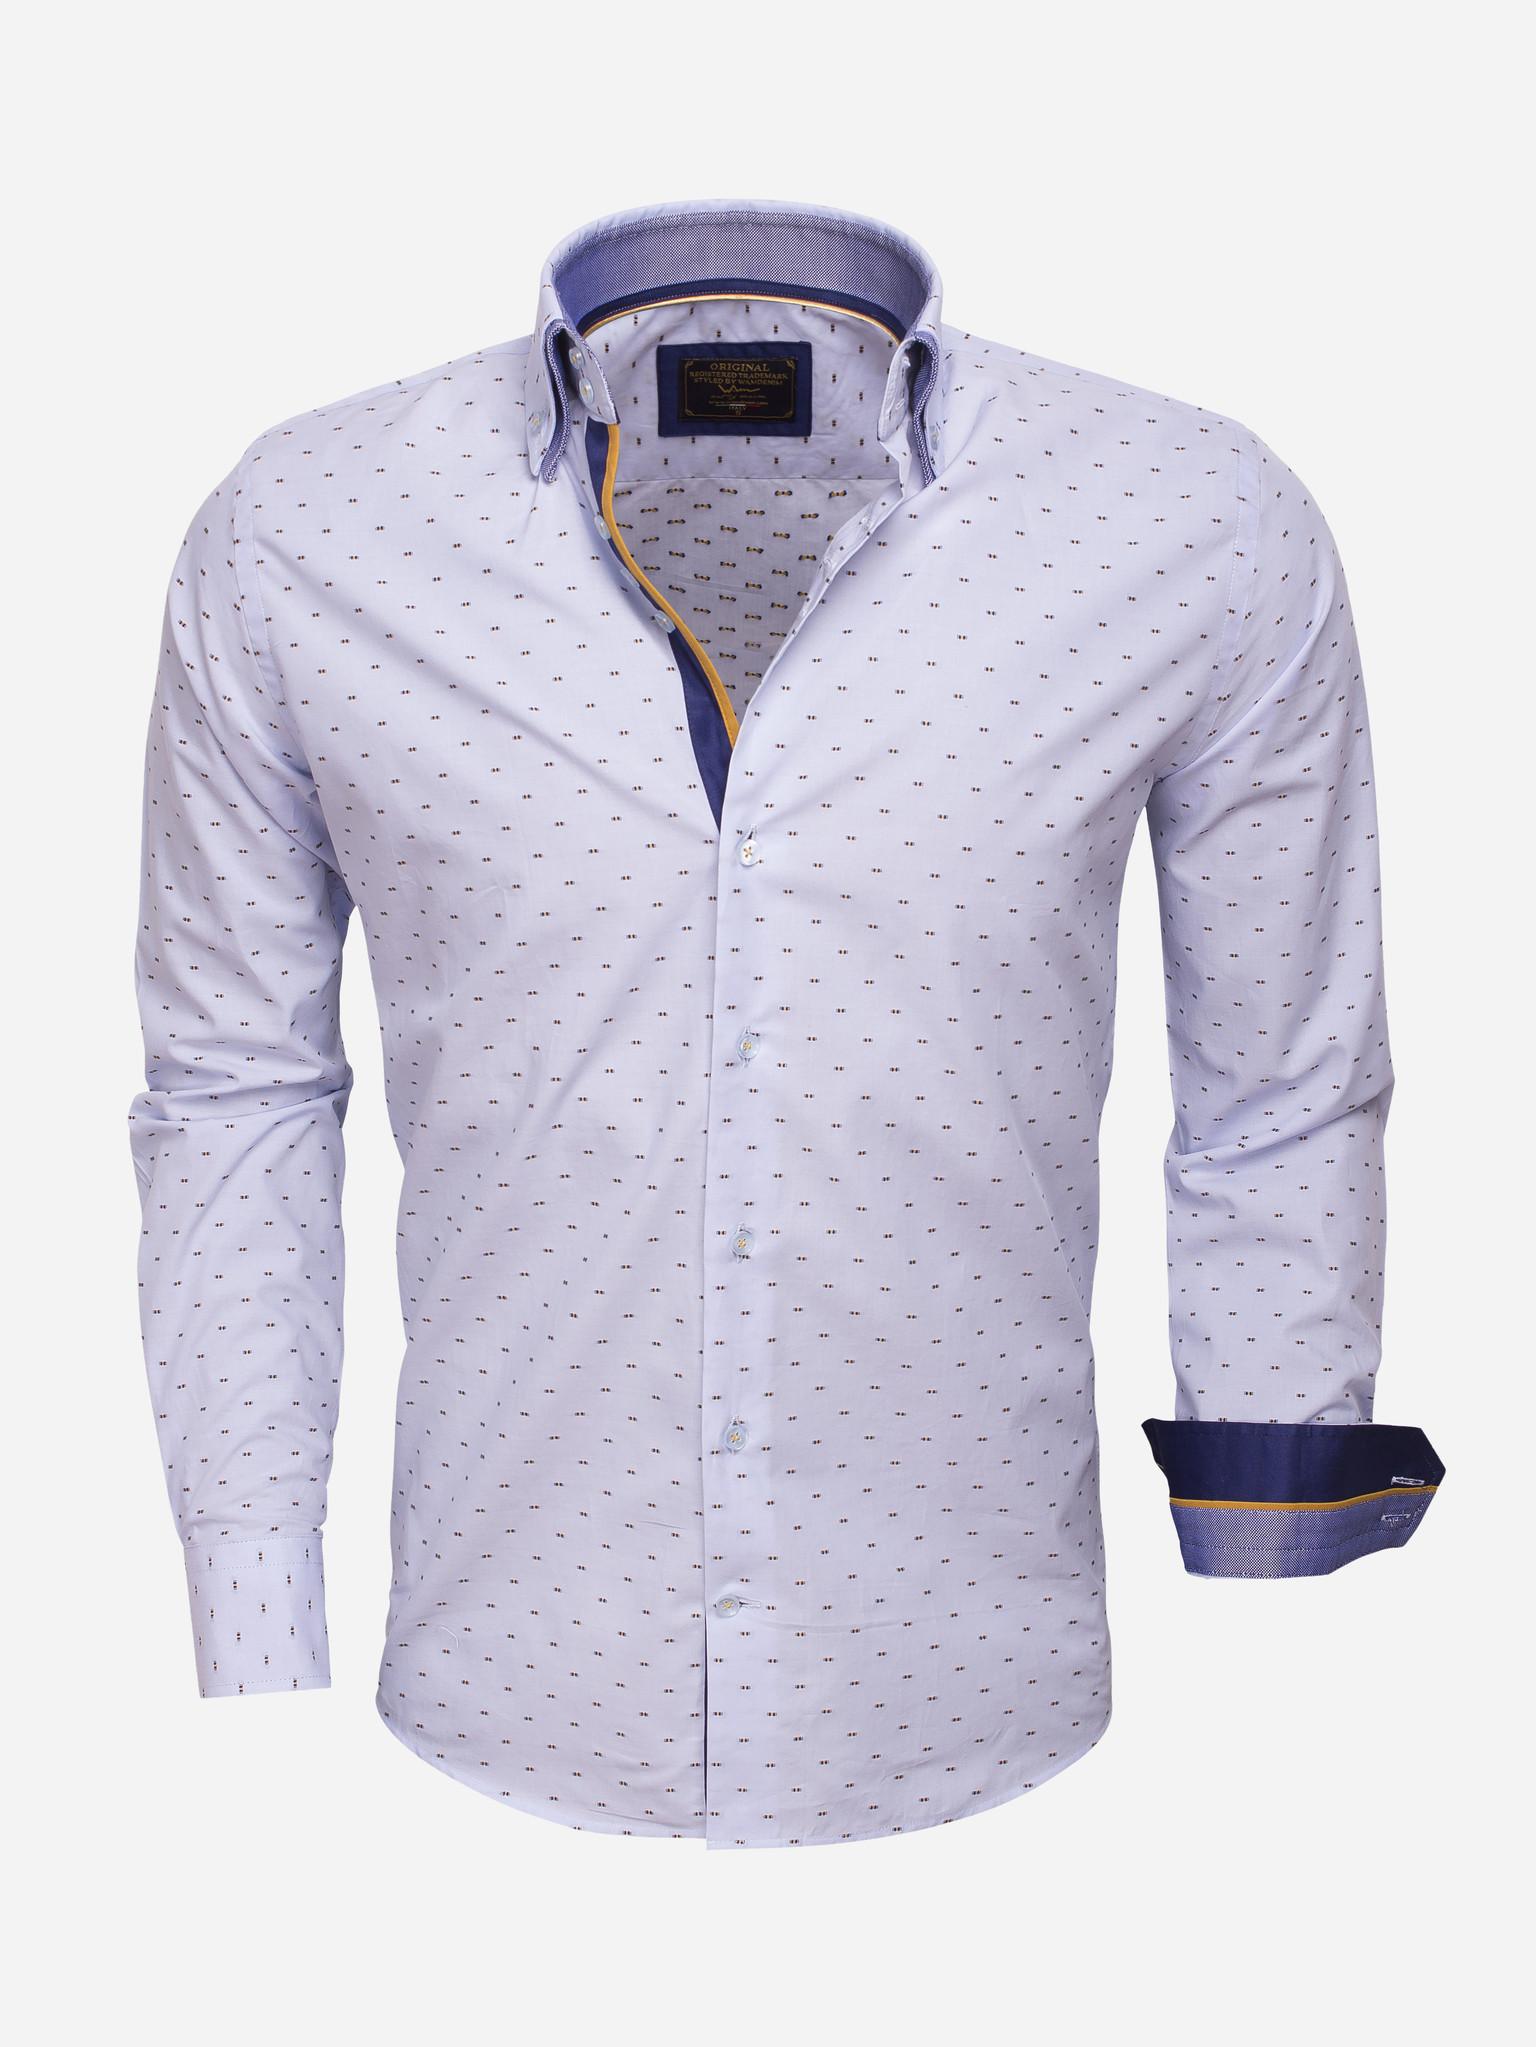 Wam Denim Overhemd Lange Mouw  Maat: XL